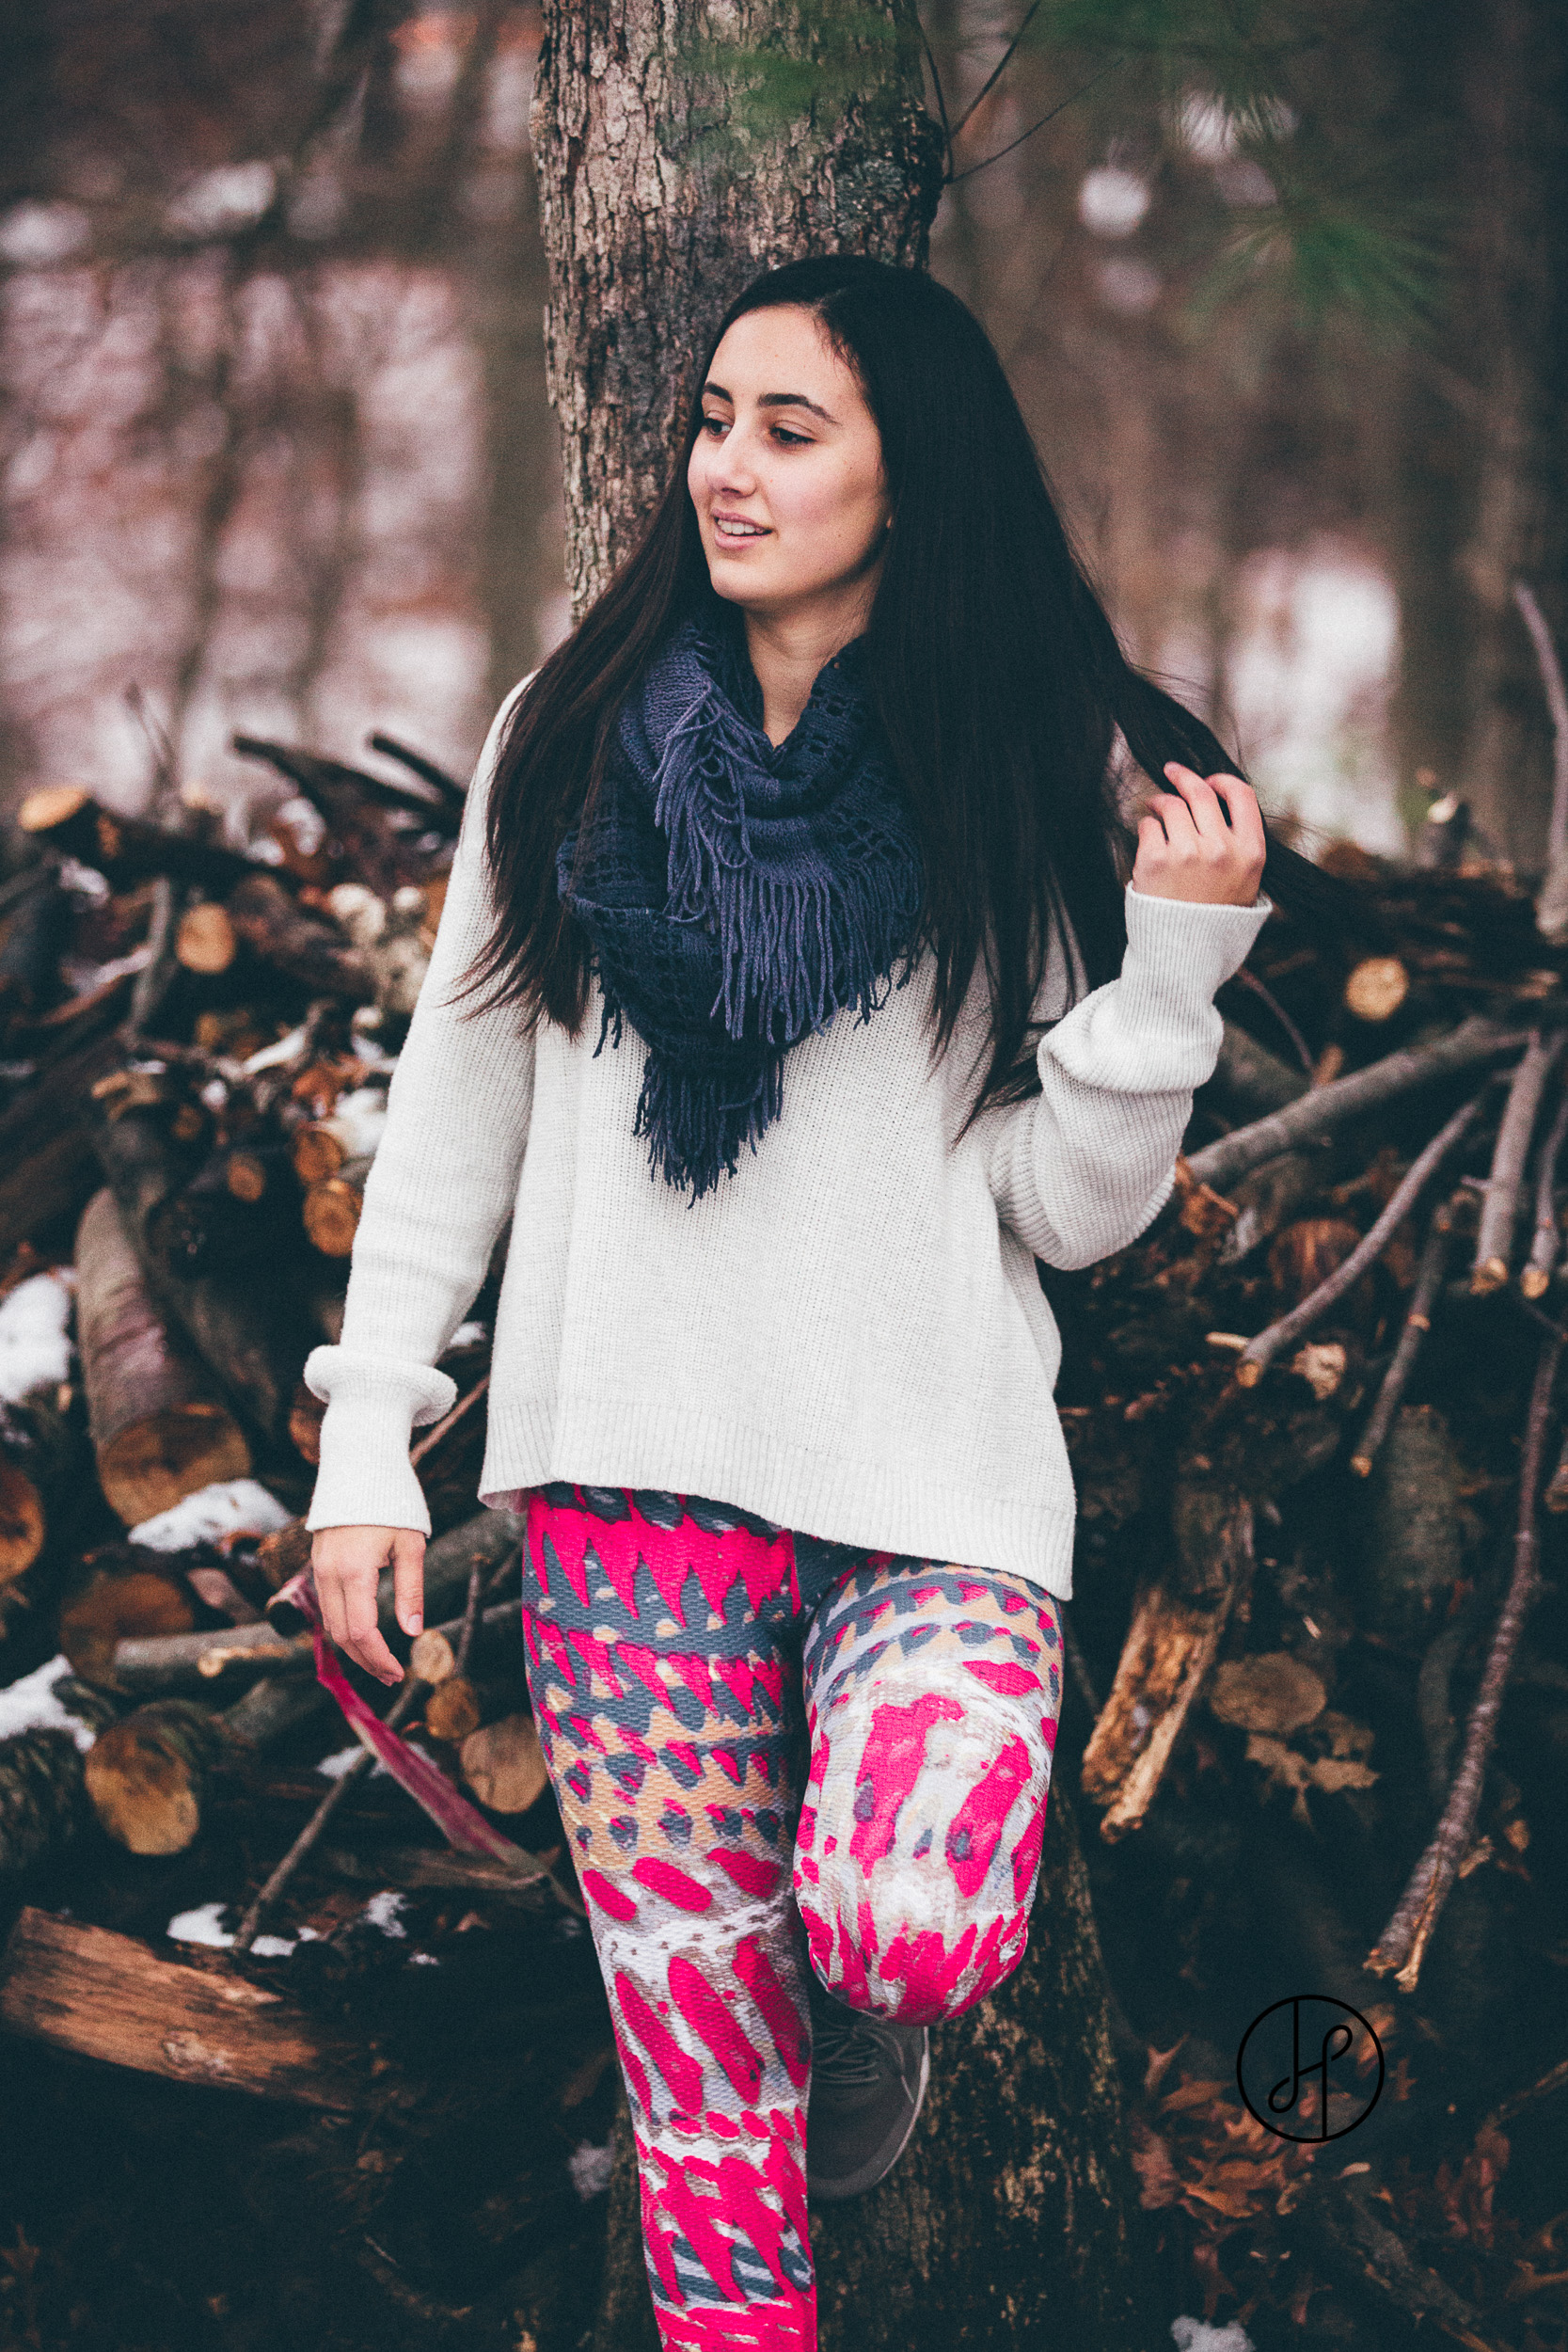 Pitanga_Winter_Fitness_Leggings_Jennifer_Helmka-5.jpg